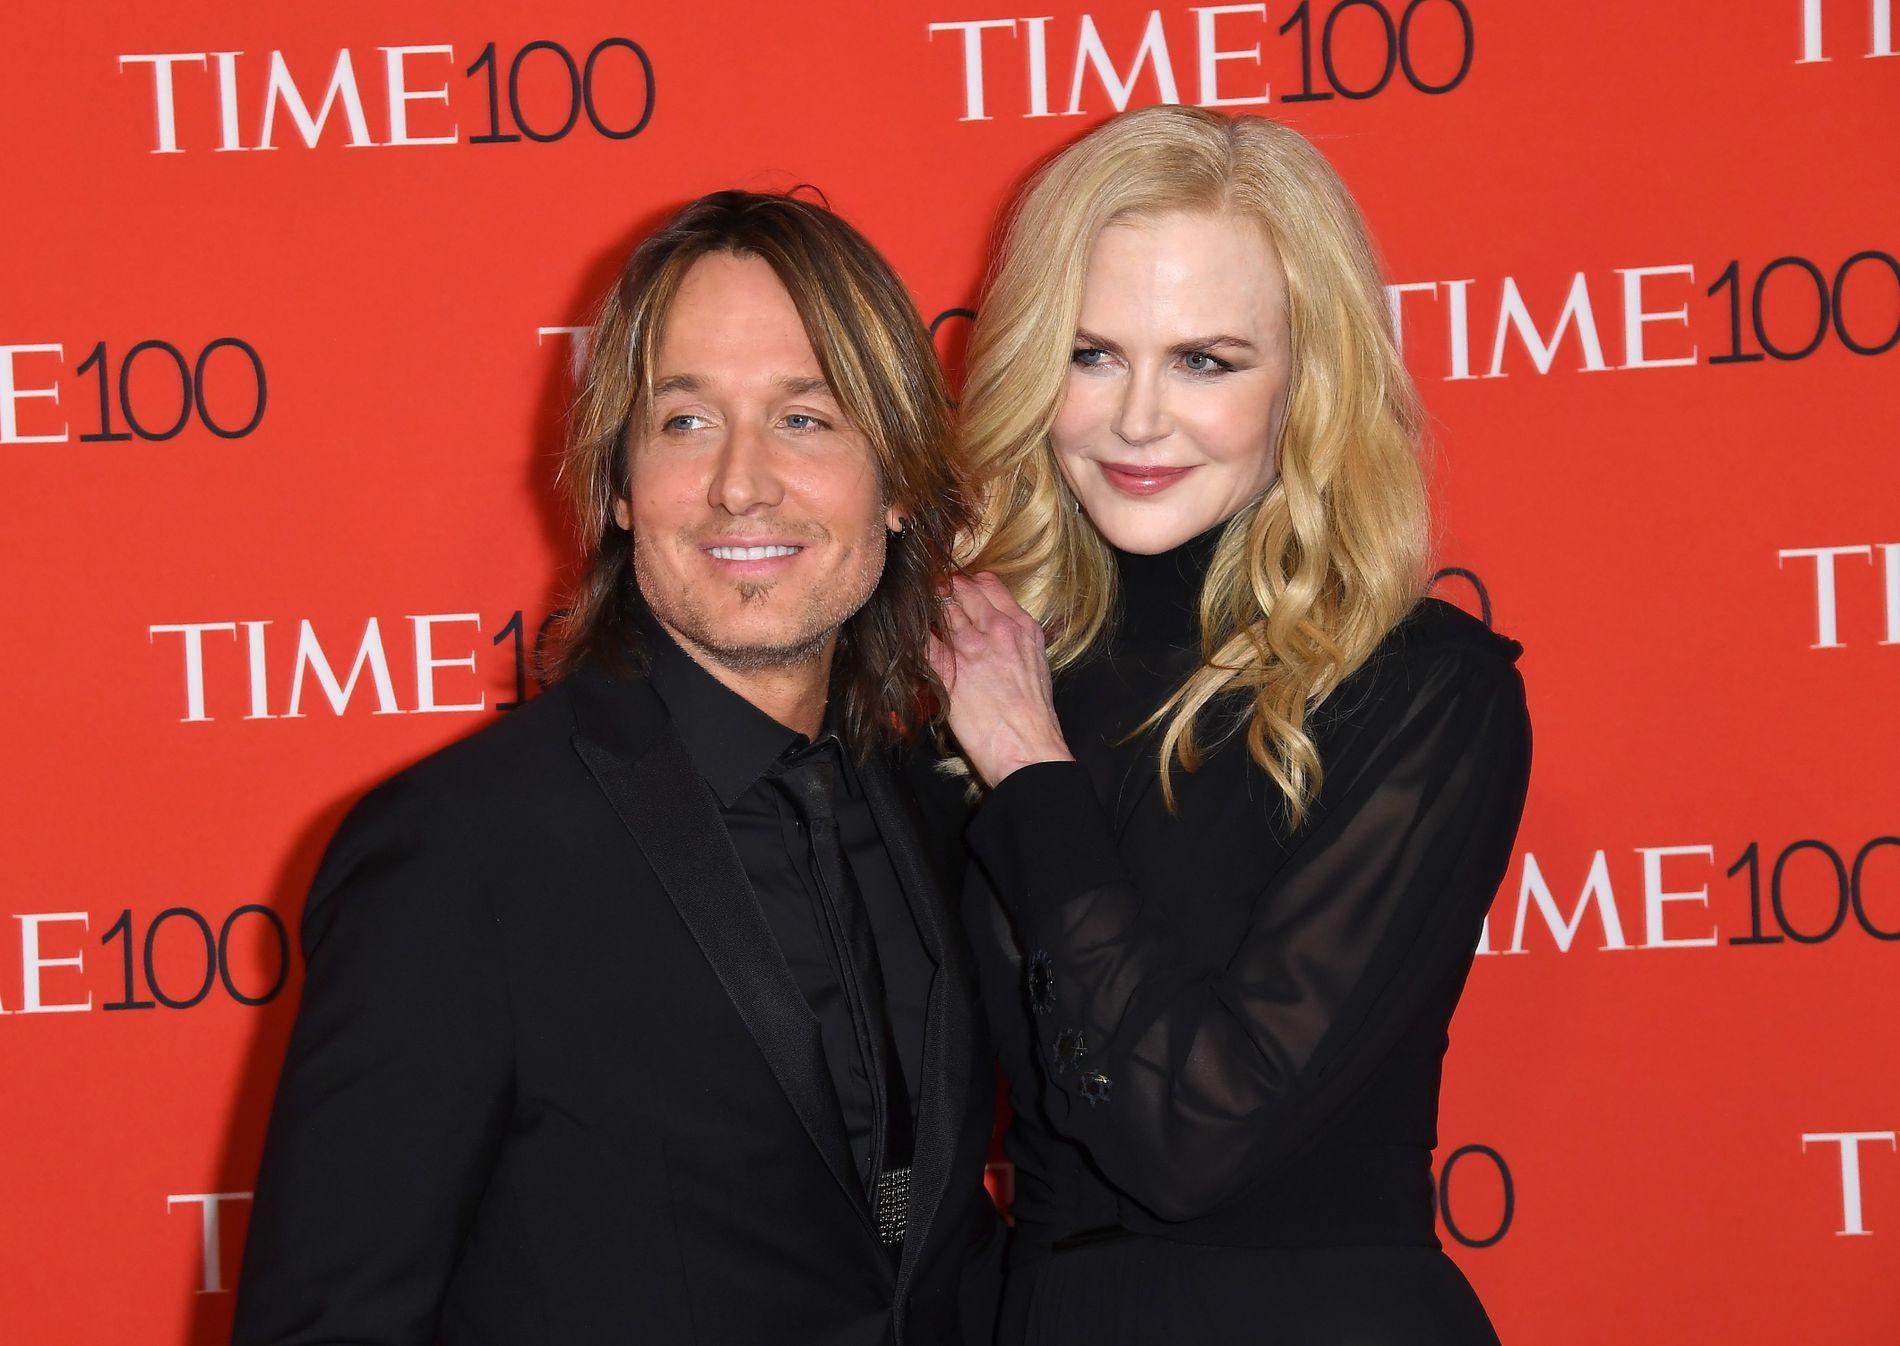 EKTEPAR: Keith Urban og Nicole Kidman på Time 100 Gala i New York i april i år.